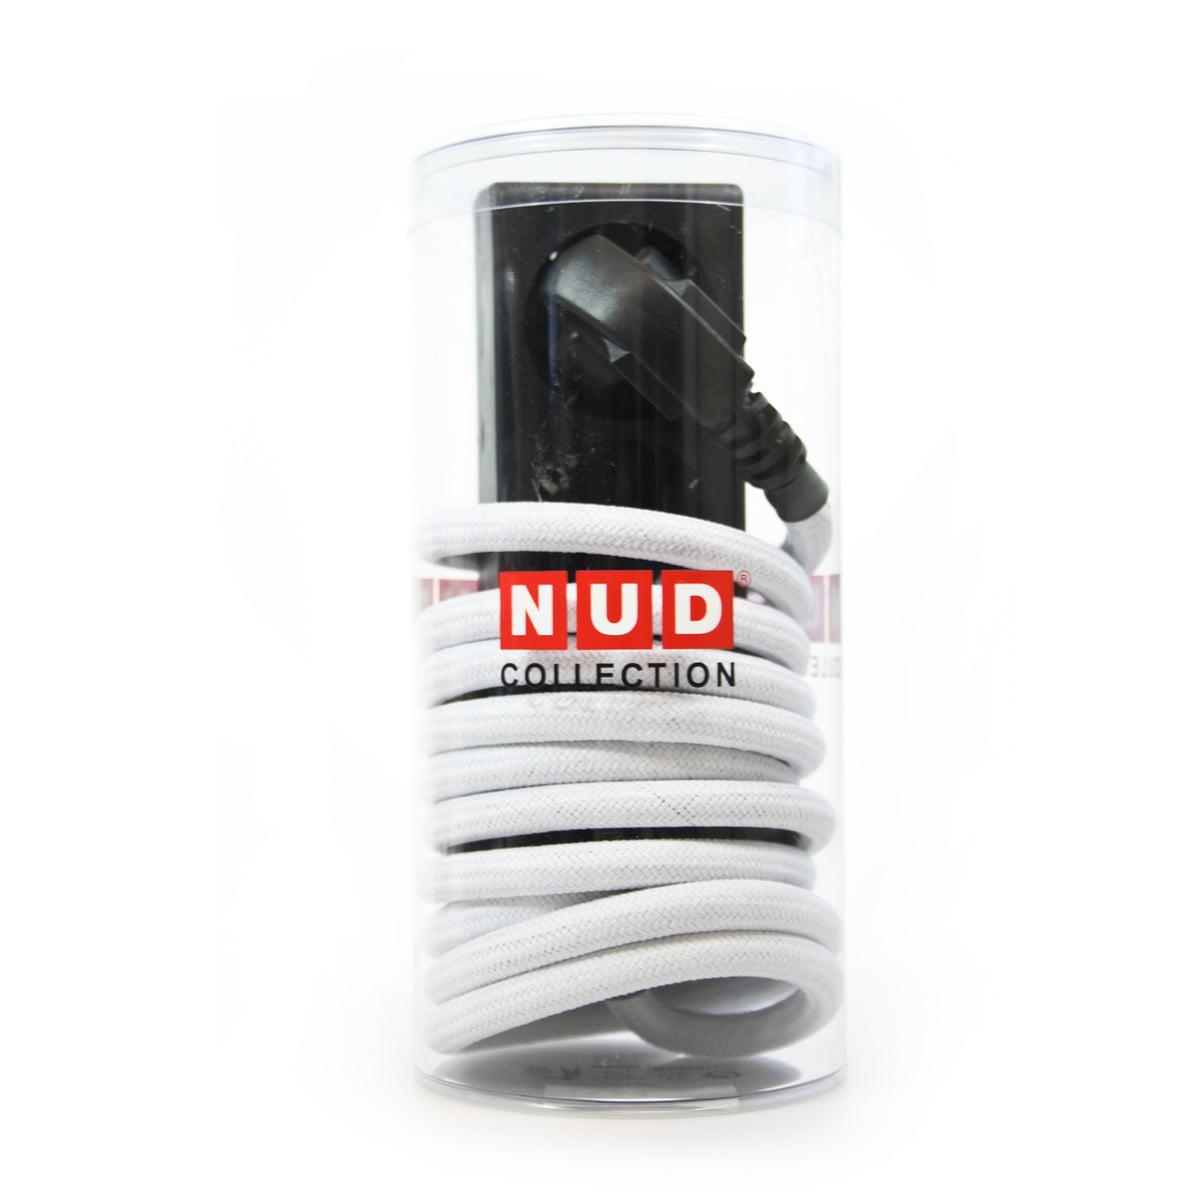 NUD Collection - Extension Cord 3fach-Steckdose, Wimbledon (TT-01)   Baumarkt > Elektroinstallation   NUD Collection